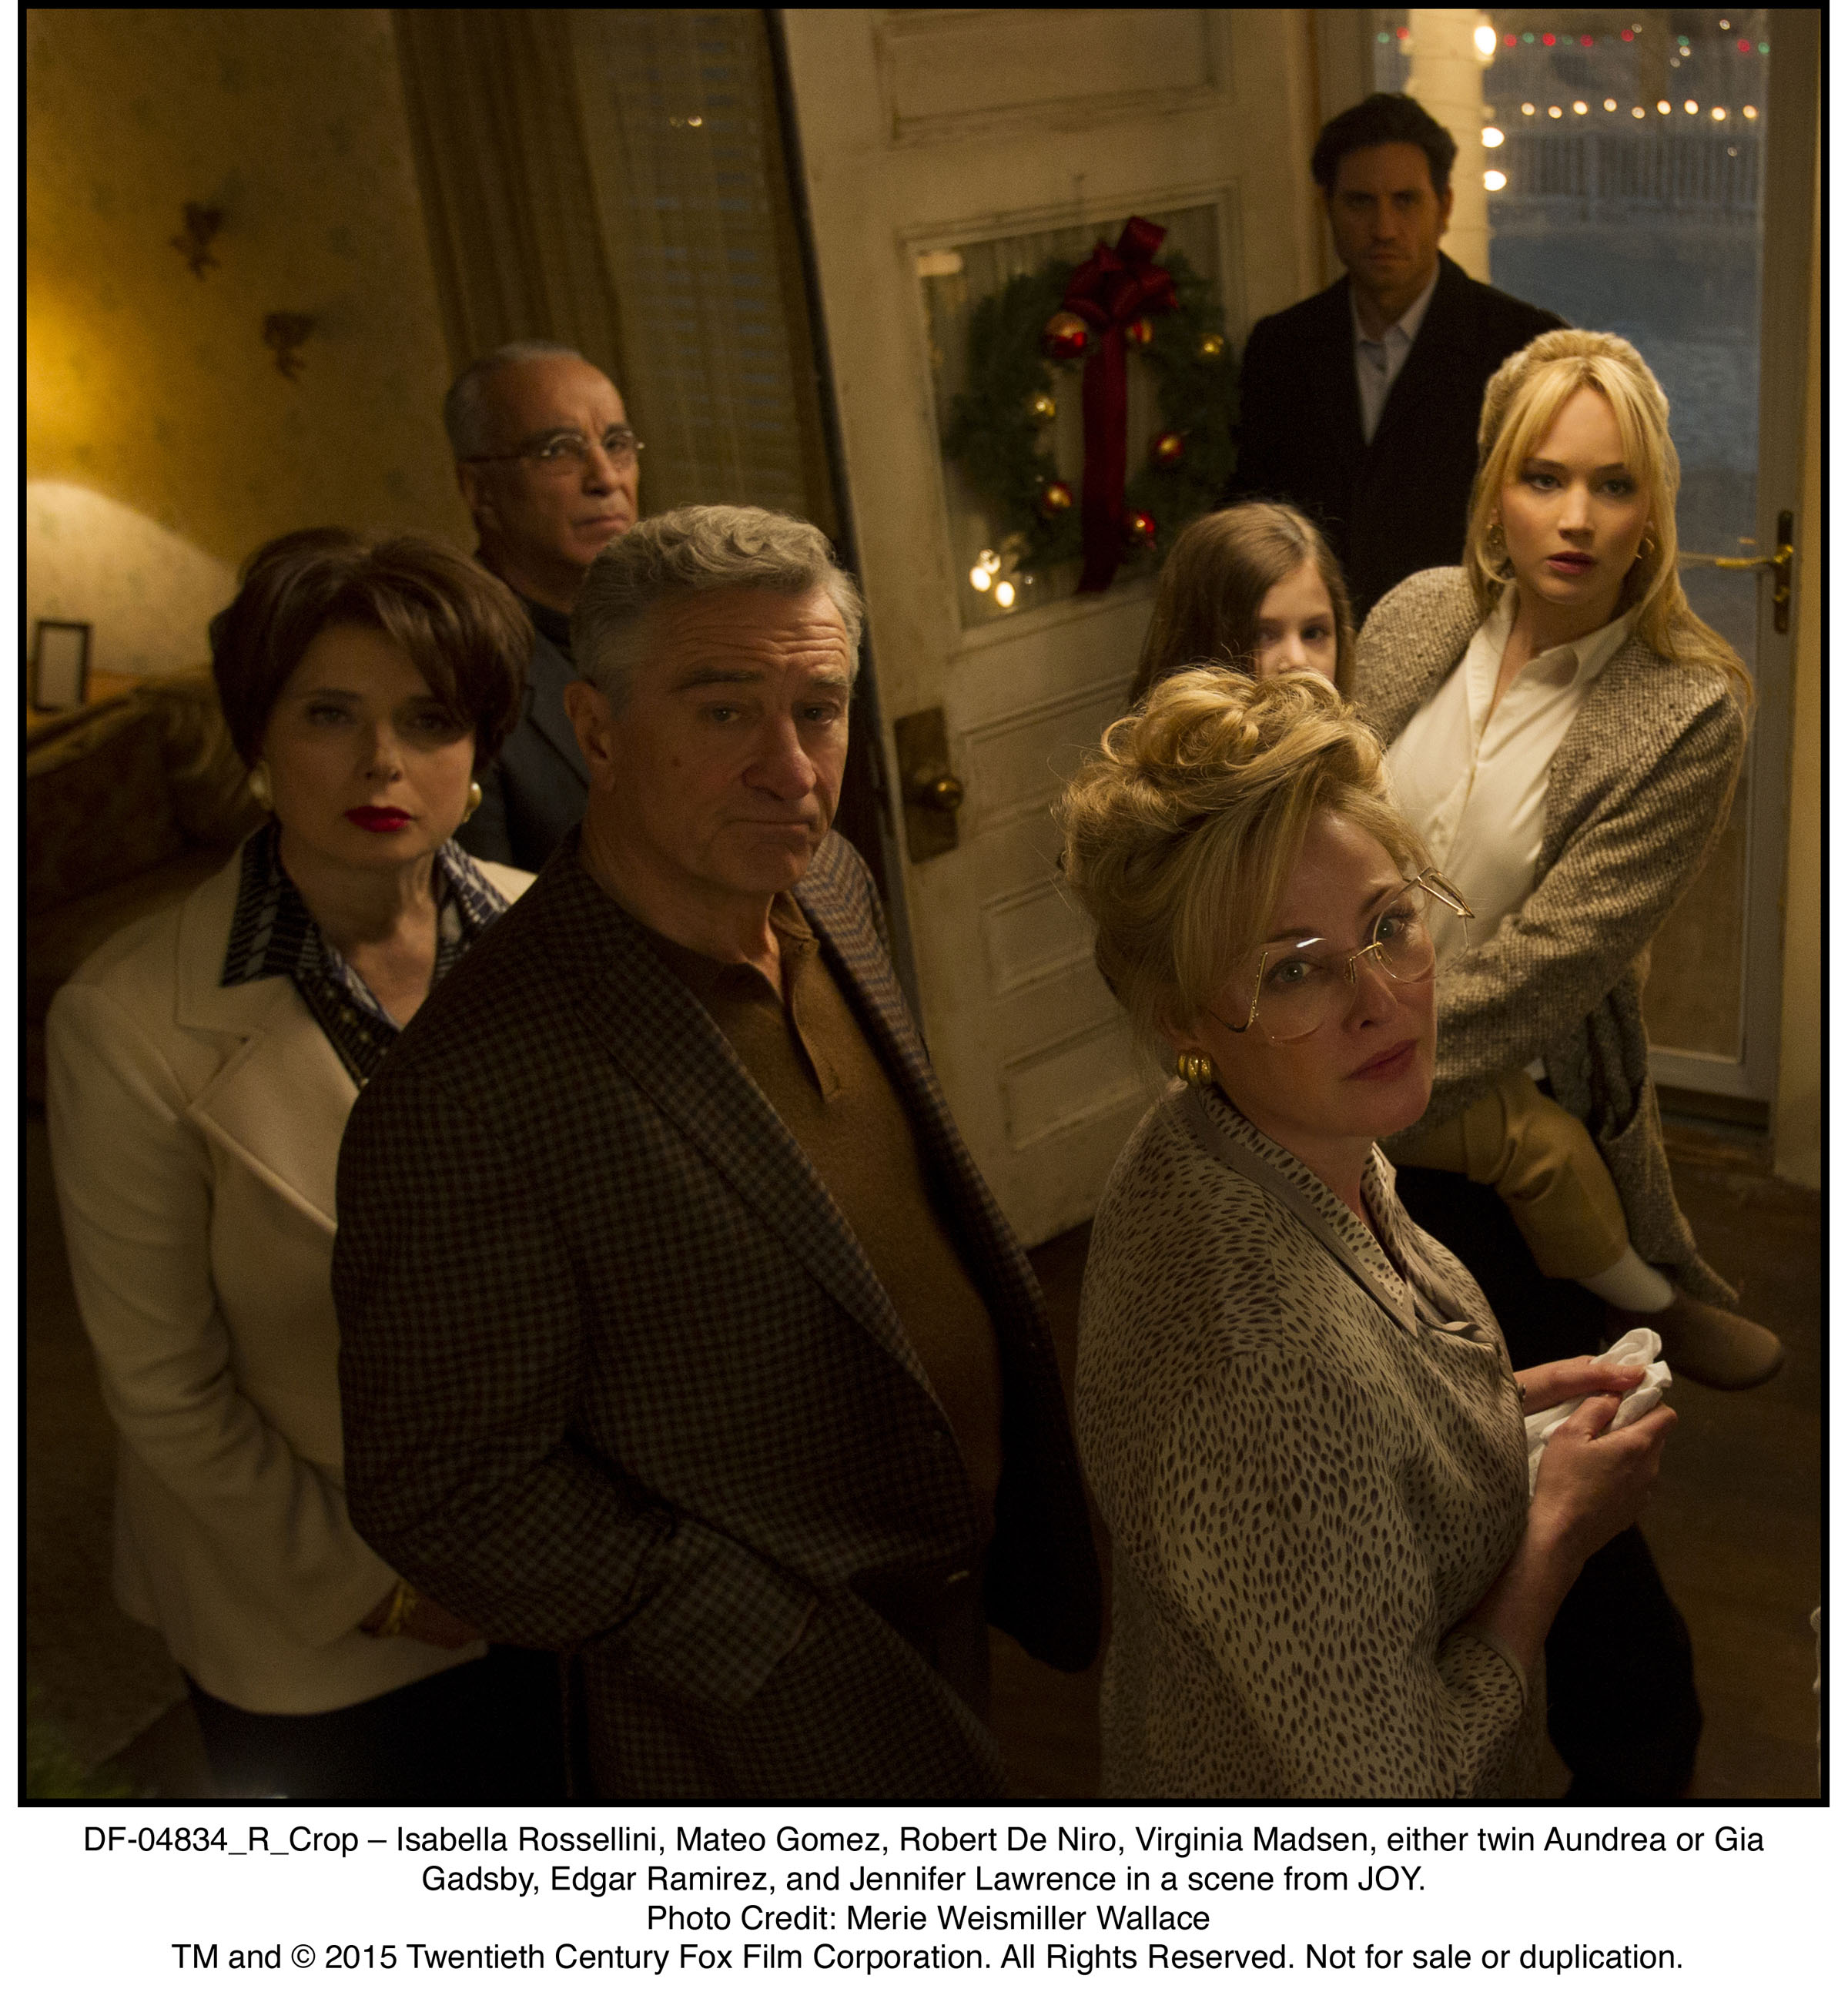 DF-04834_R_Crop – Isabella Rossellini, Mateo Gomez, Robert De Niro, Virginia Madsen, either twin Aundrea or Gia Gadsby, Edgar Ramirez, and Jennifer Lawrence in a scene from JOY.